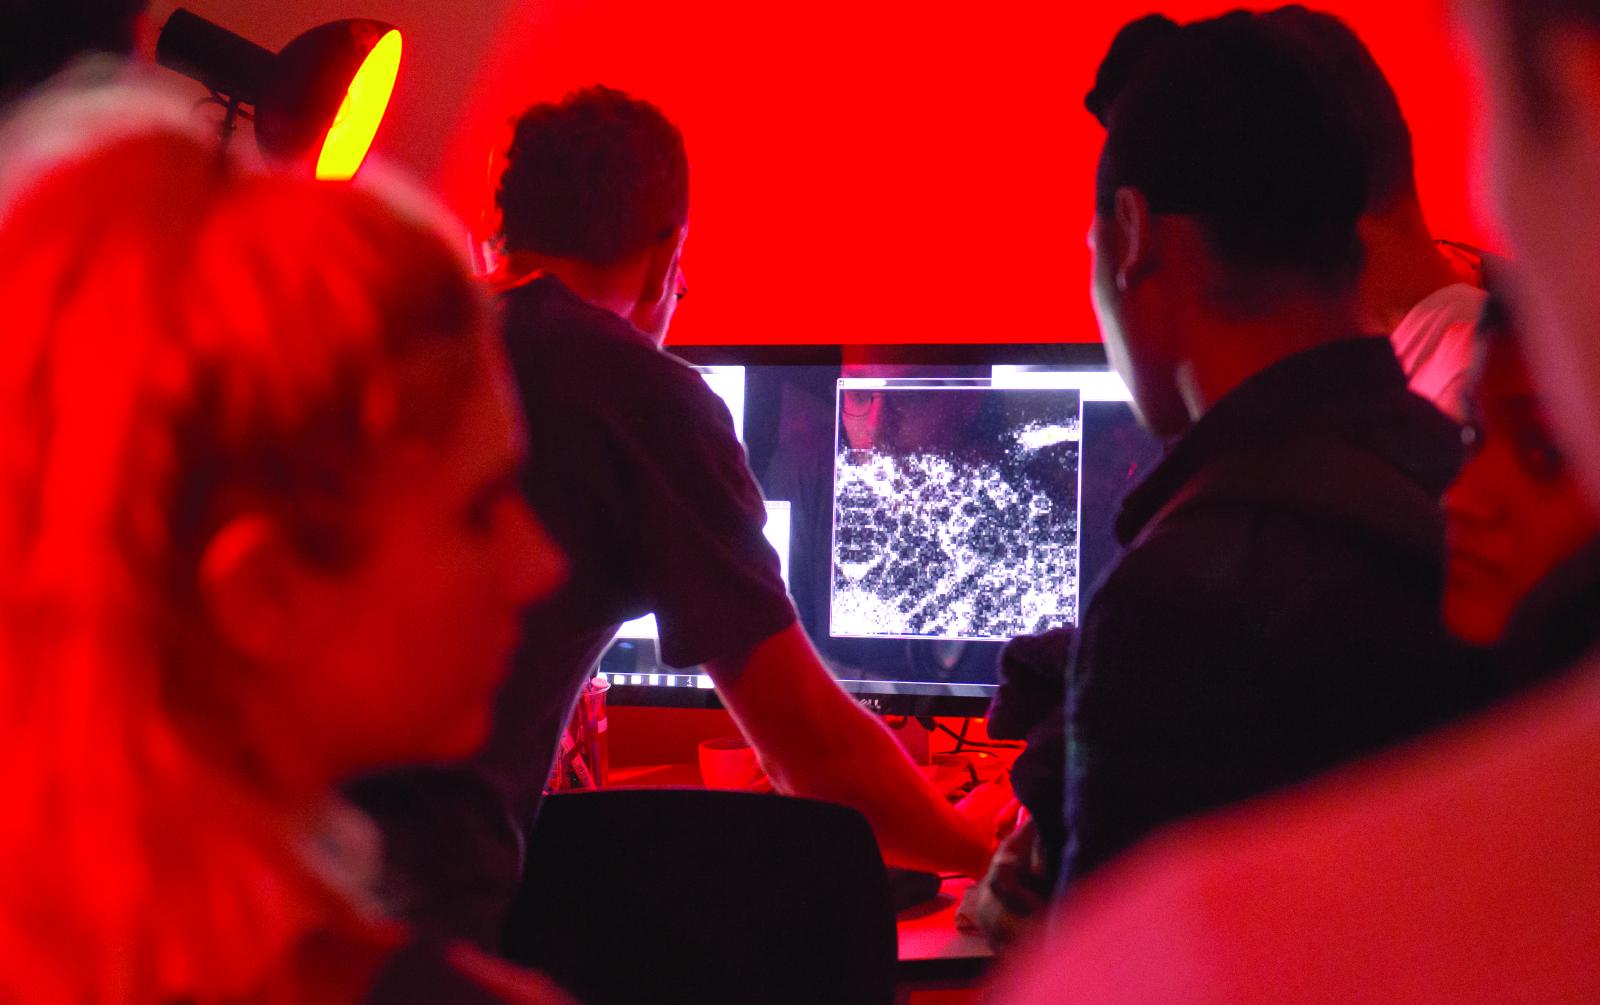 Neuroscience students looking at neural data on a computer monitor